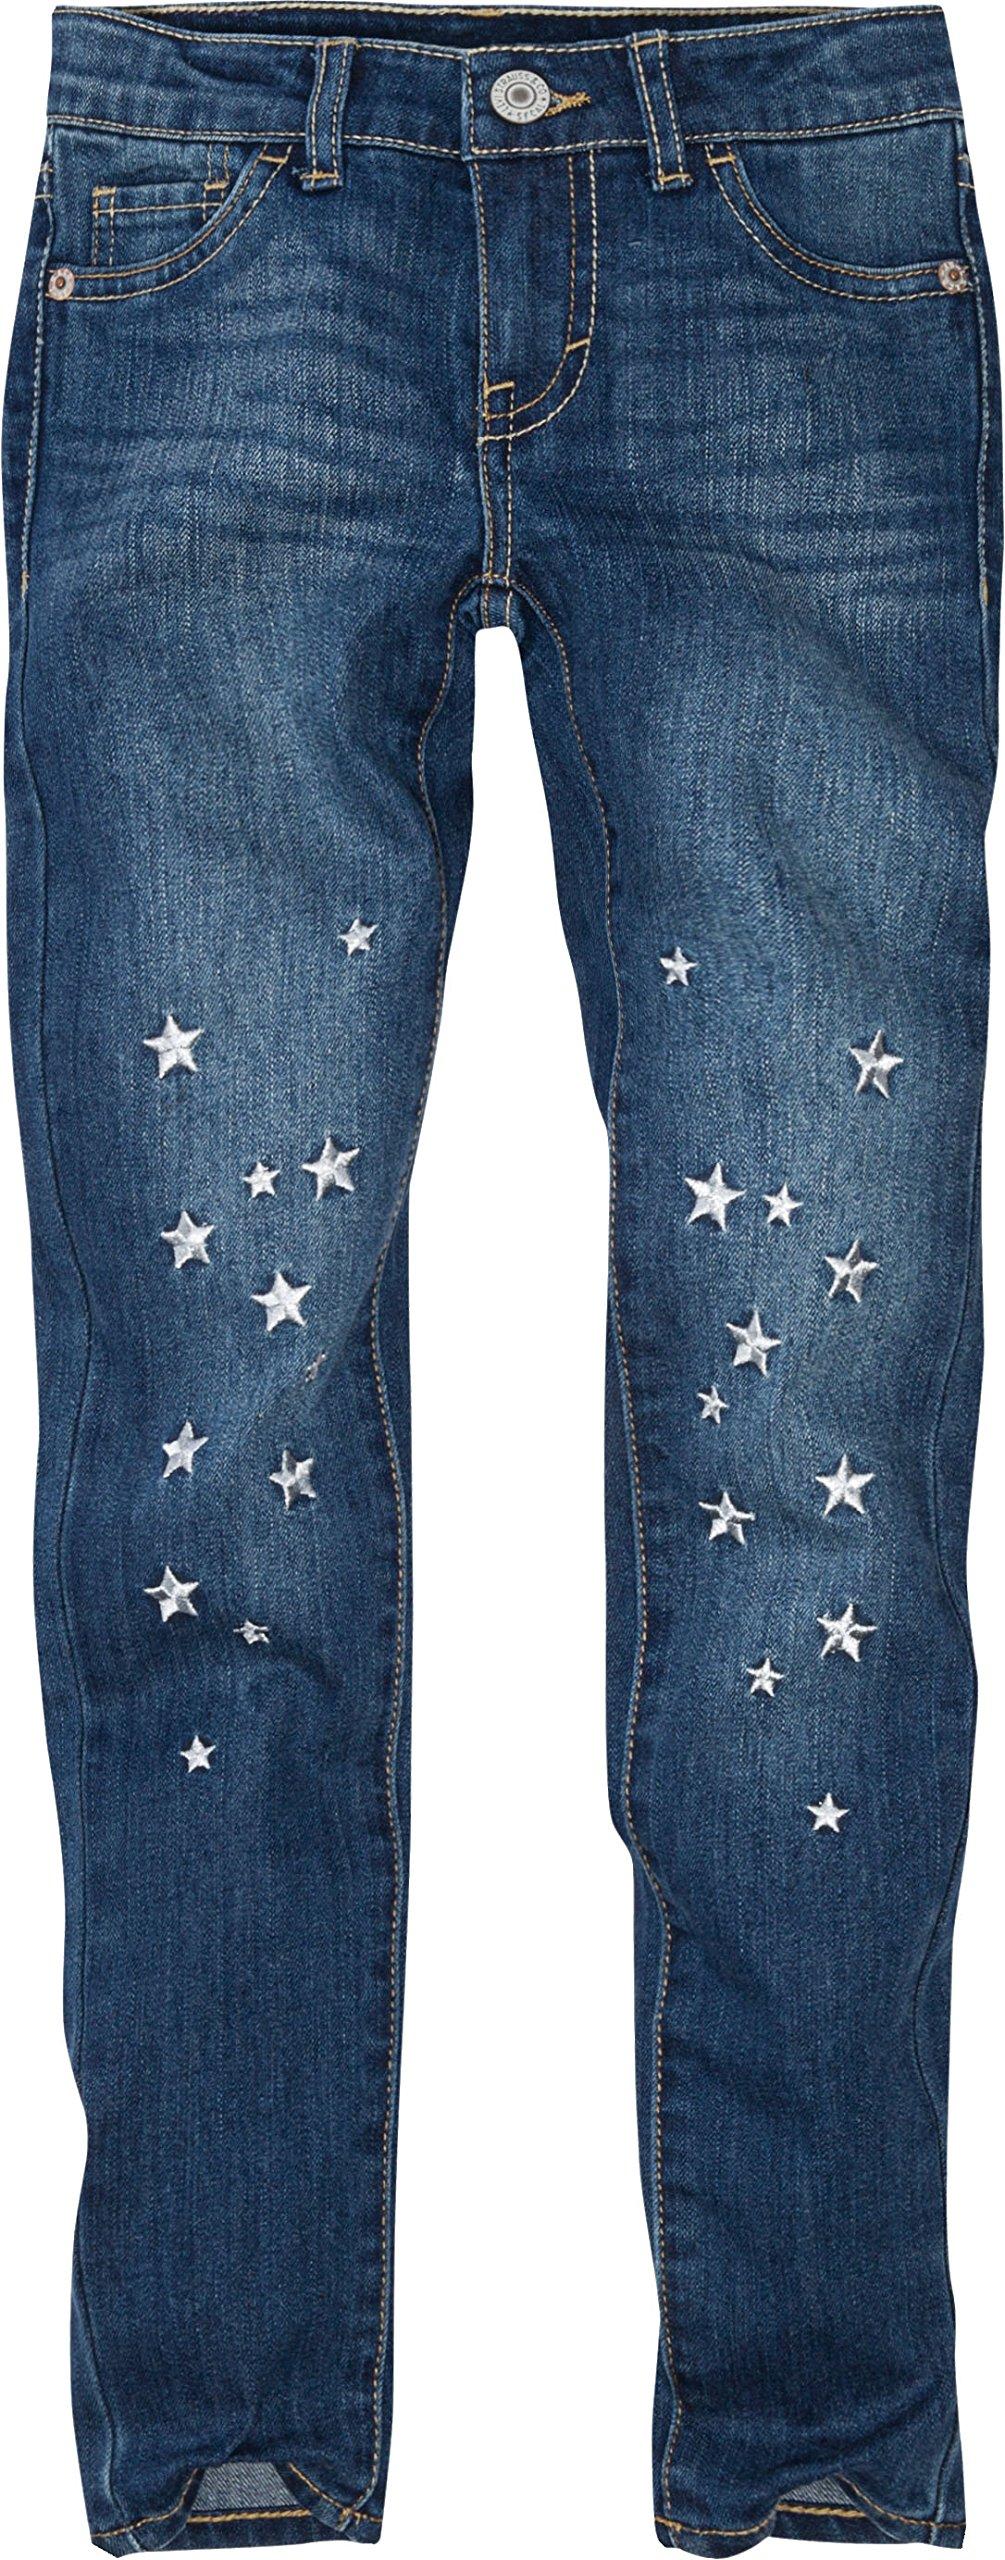 Levi's Girls' 710 Super Skinny Fit Jeans